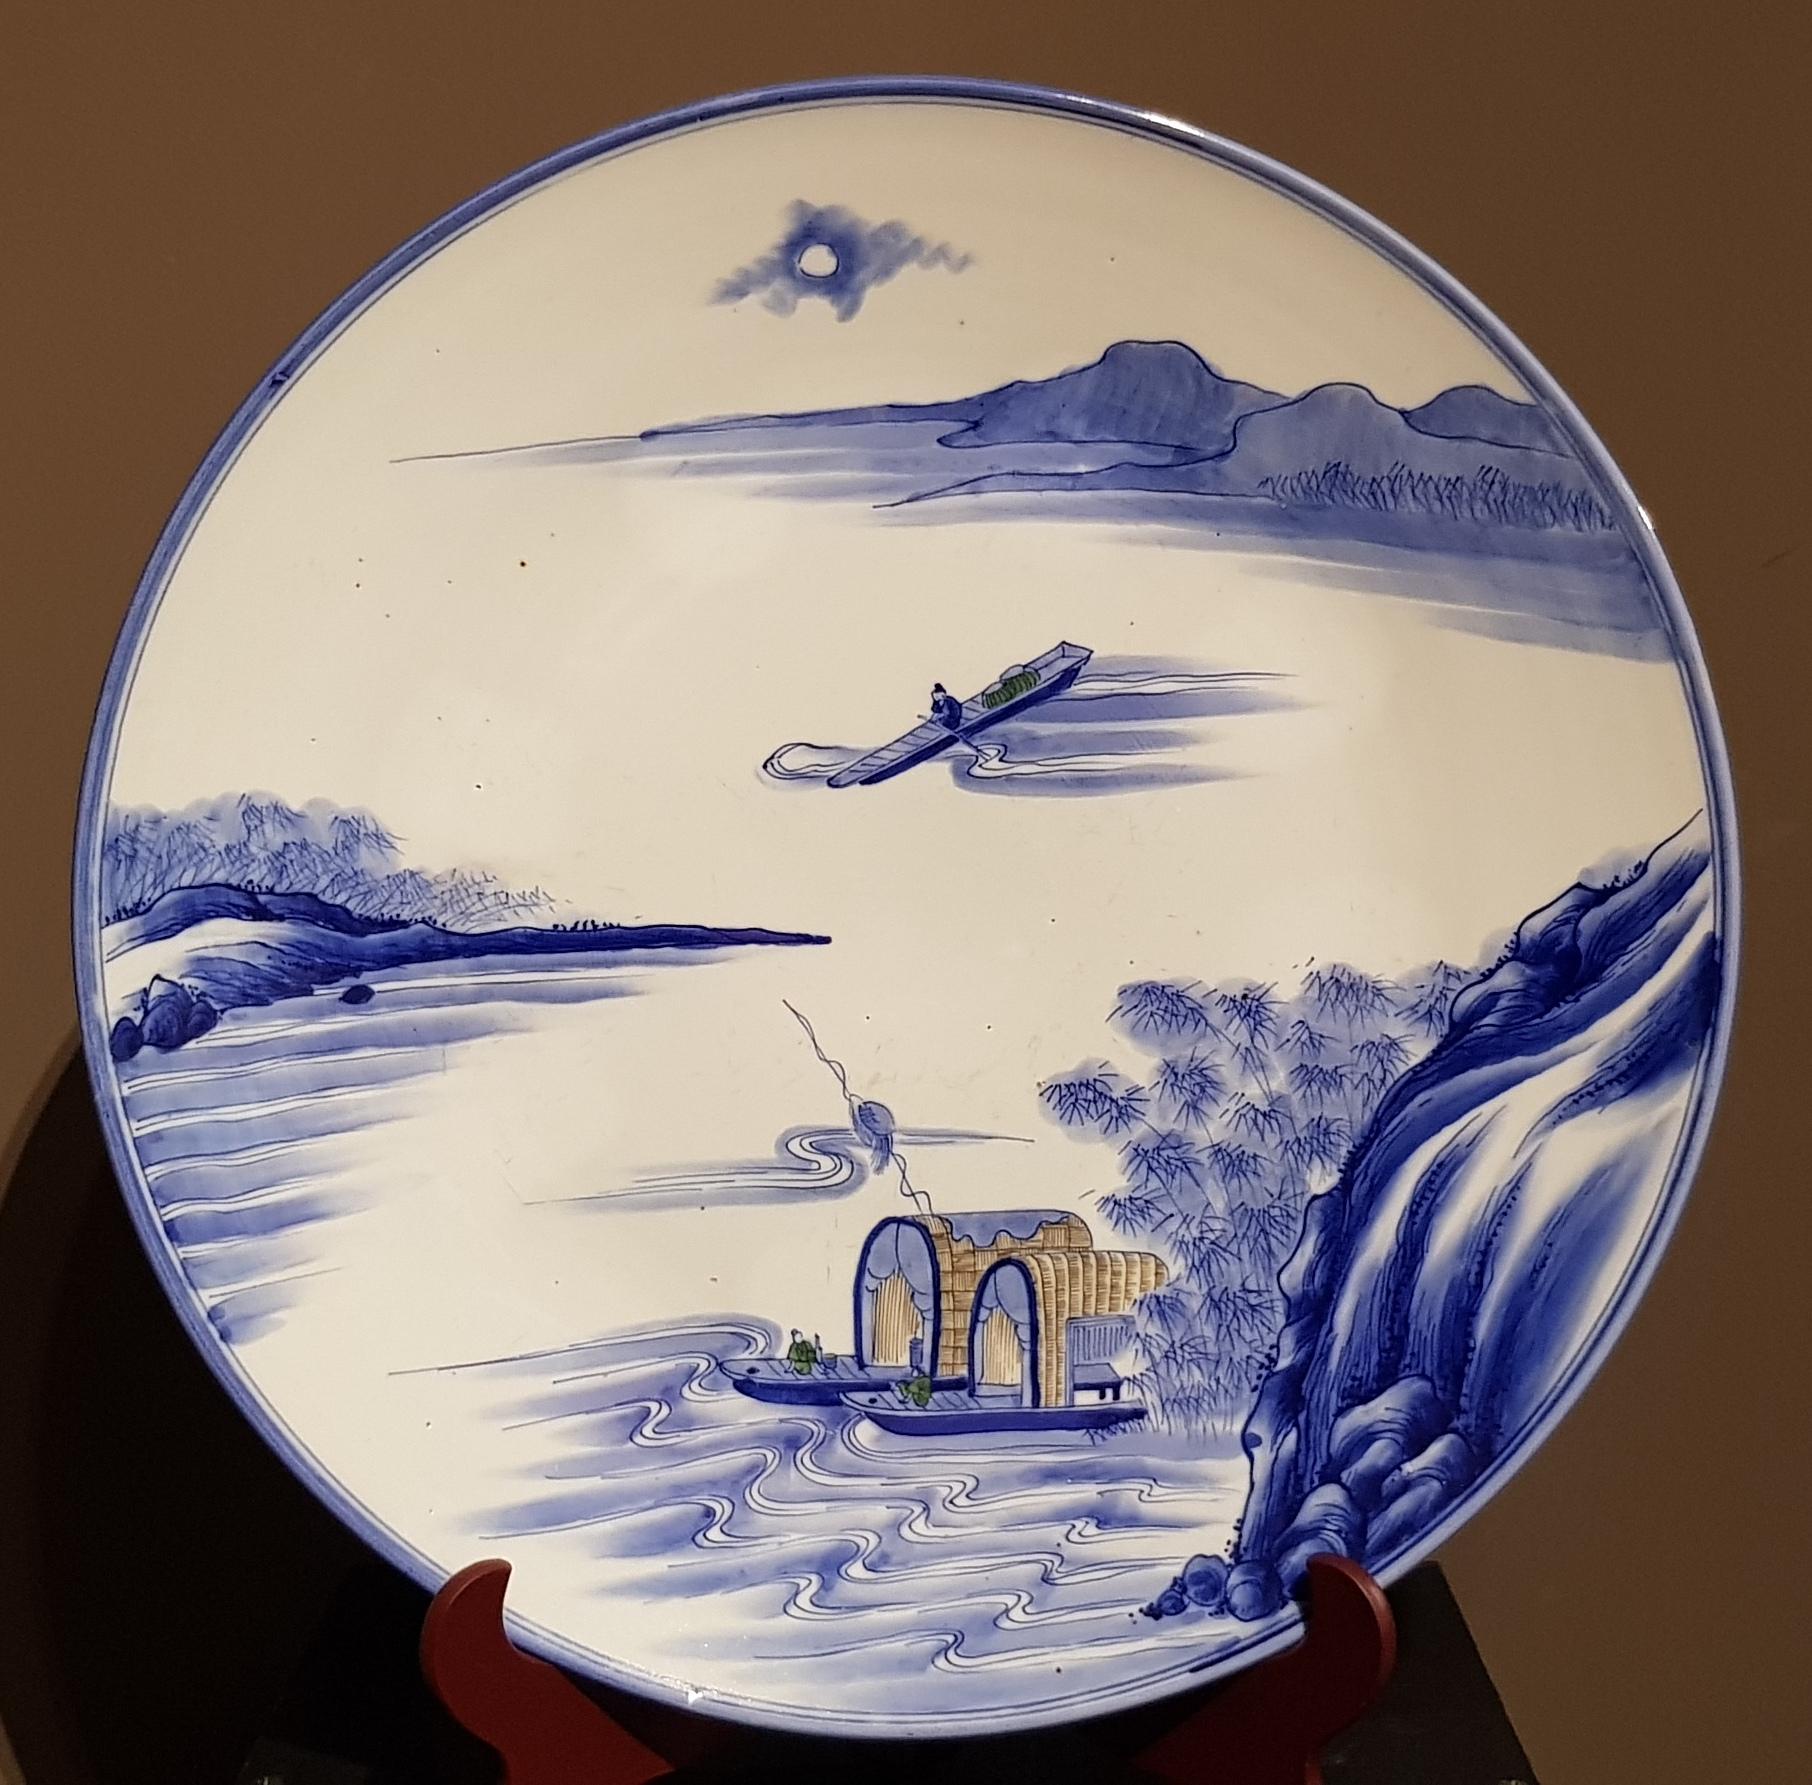 Japon - Grand plat - Marque Arita-Kakutomi - Meiji Image